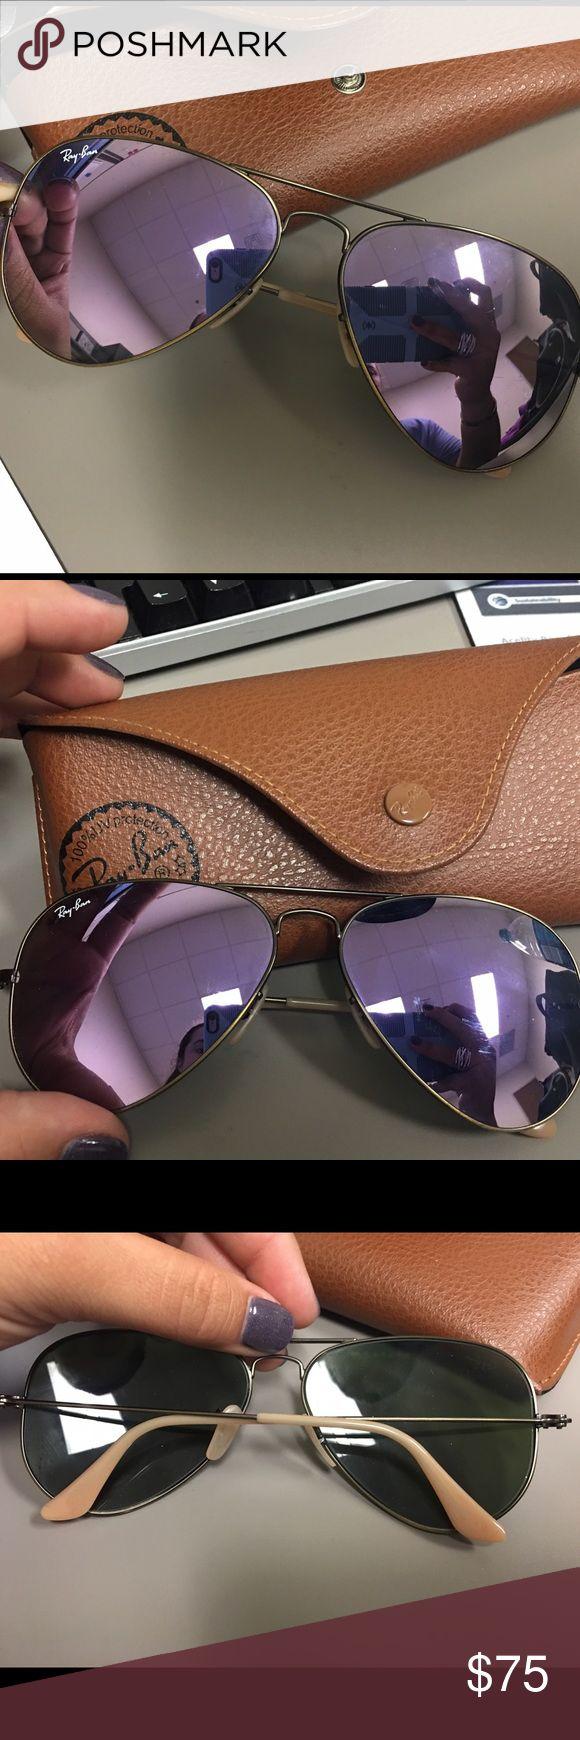 Glasses Frame Too Small : 1000+ ideas about Black Frame Glasses on Pinterest ...